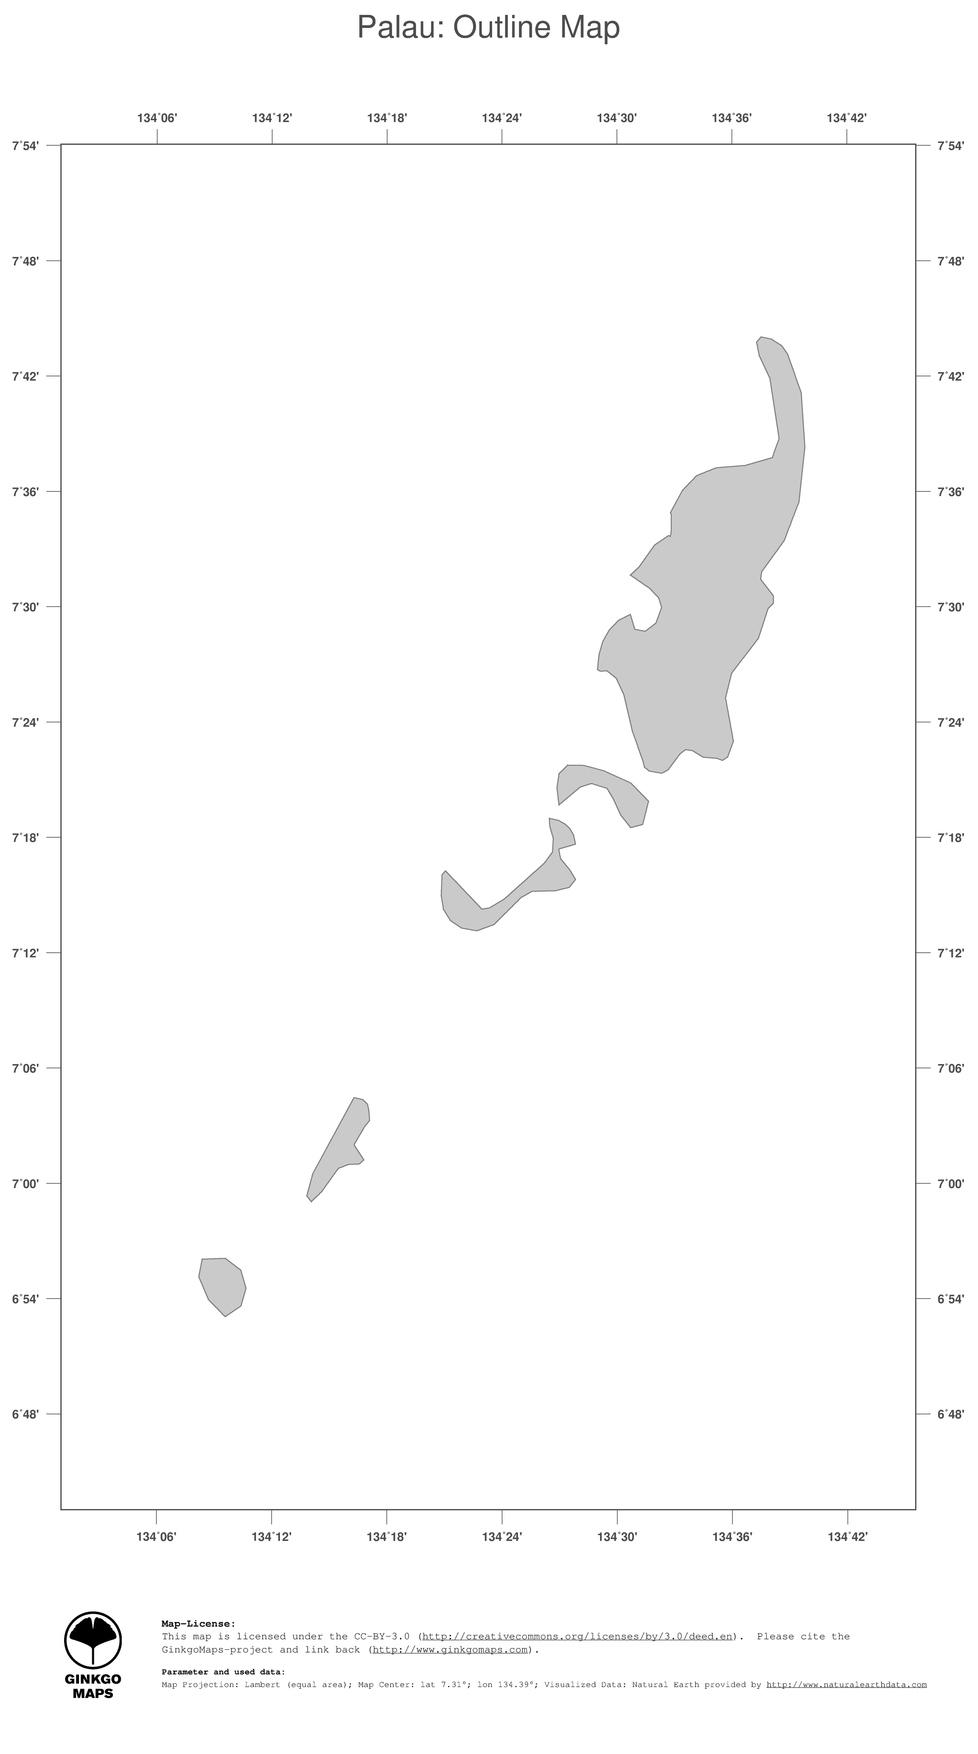 Map Palau GinkgoMaps Continent Oceania Region Palau - Palau map